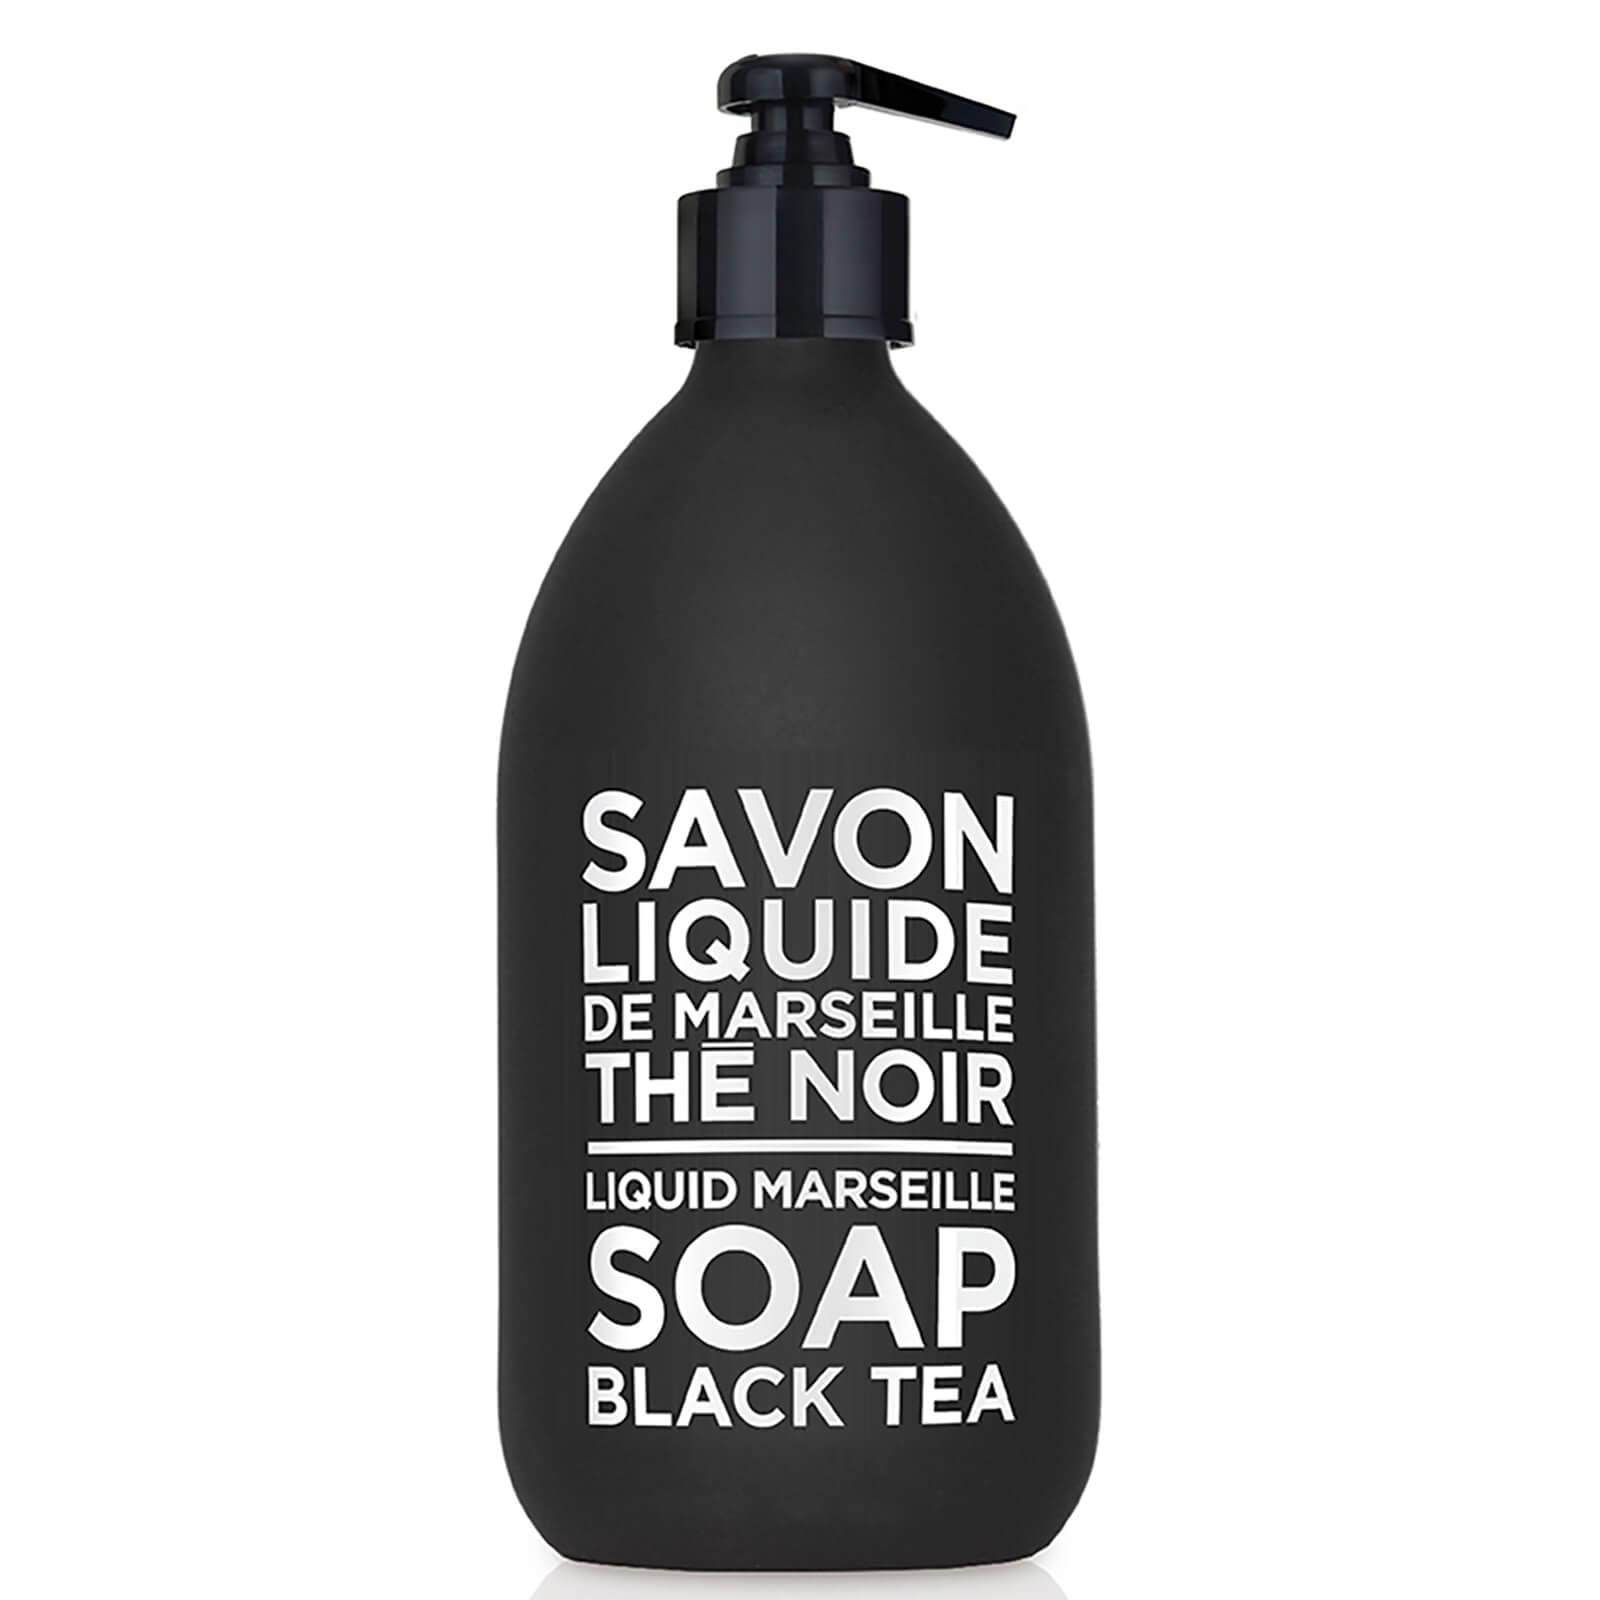 Купить Жидкое мыло Compagnie de Provence Liquid Marseille Soap 500 мл - Black Tea